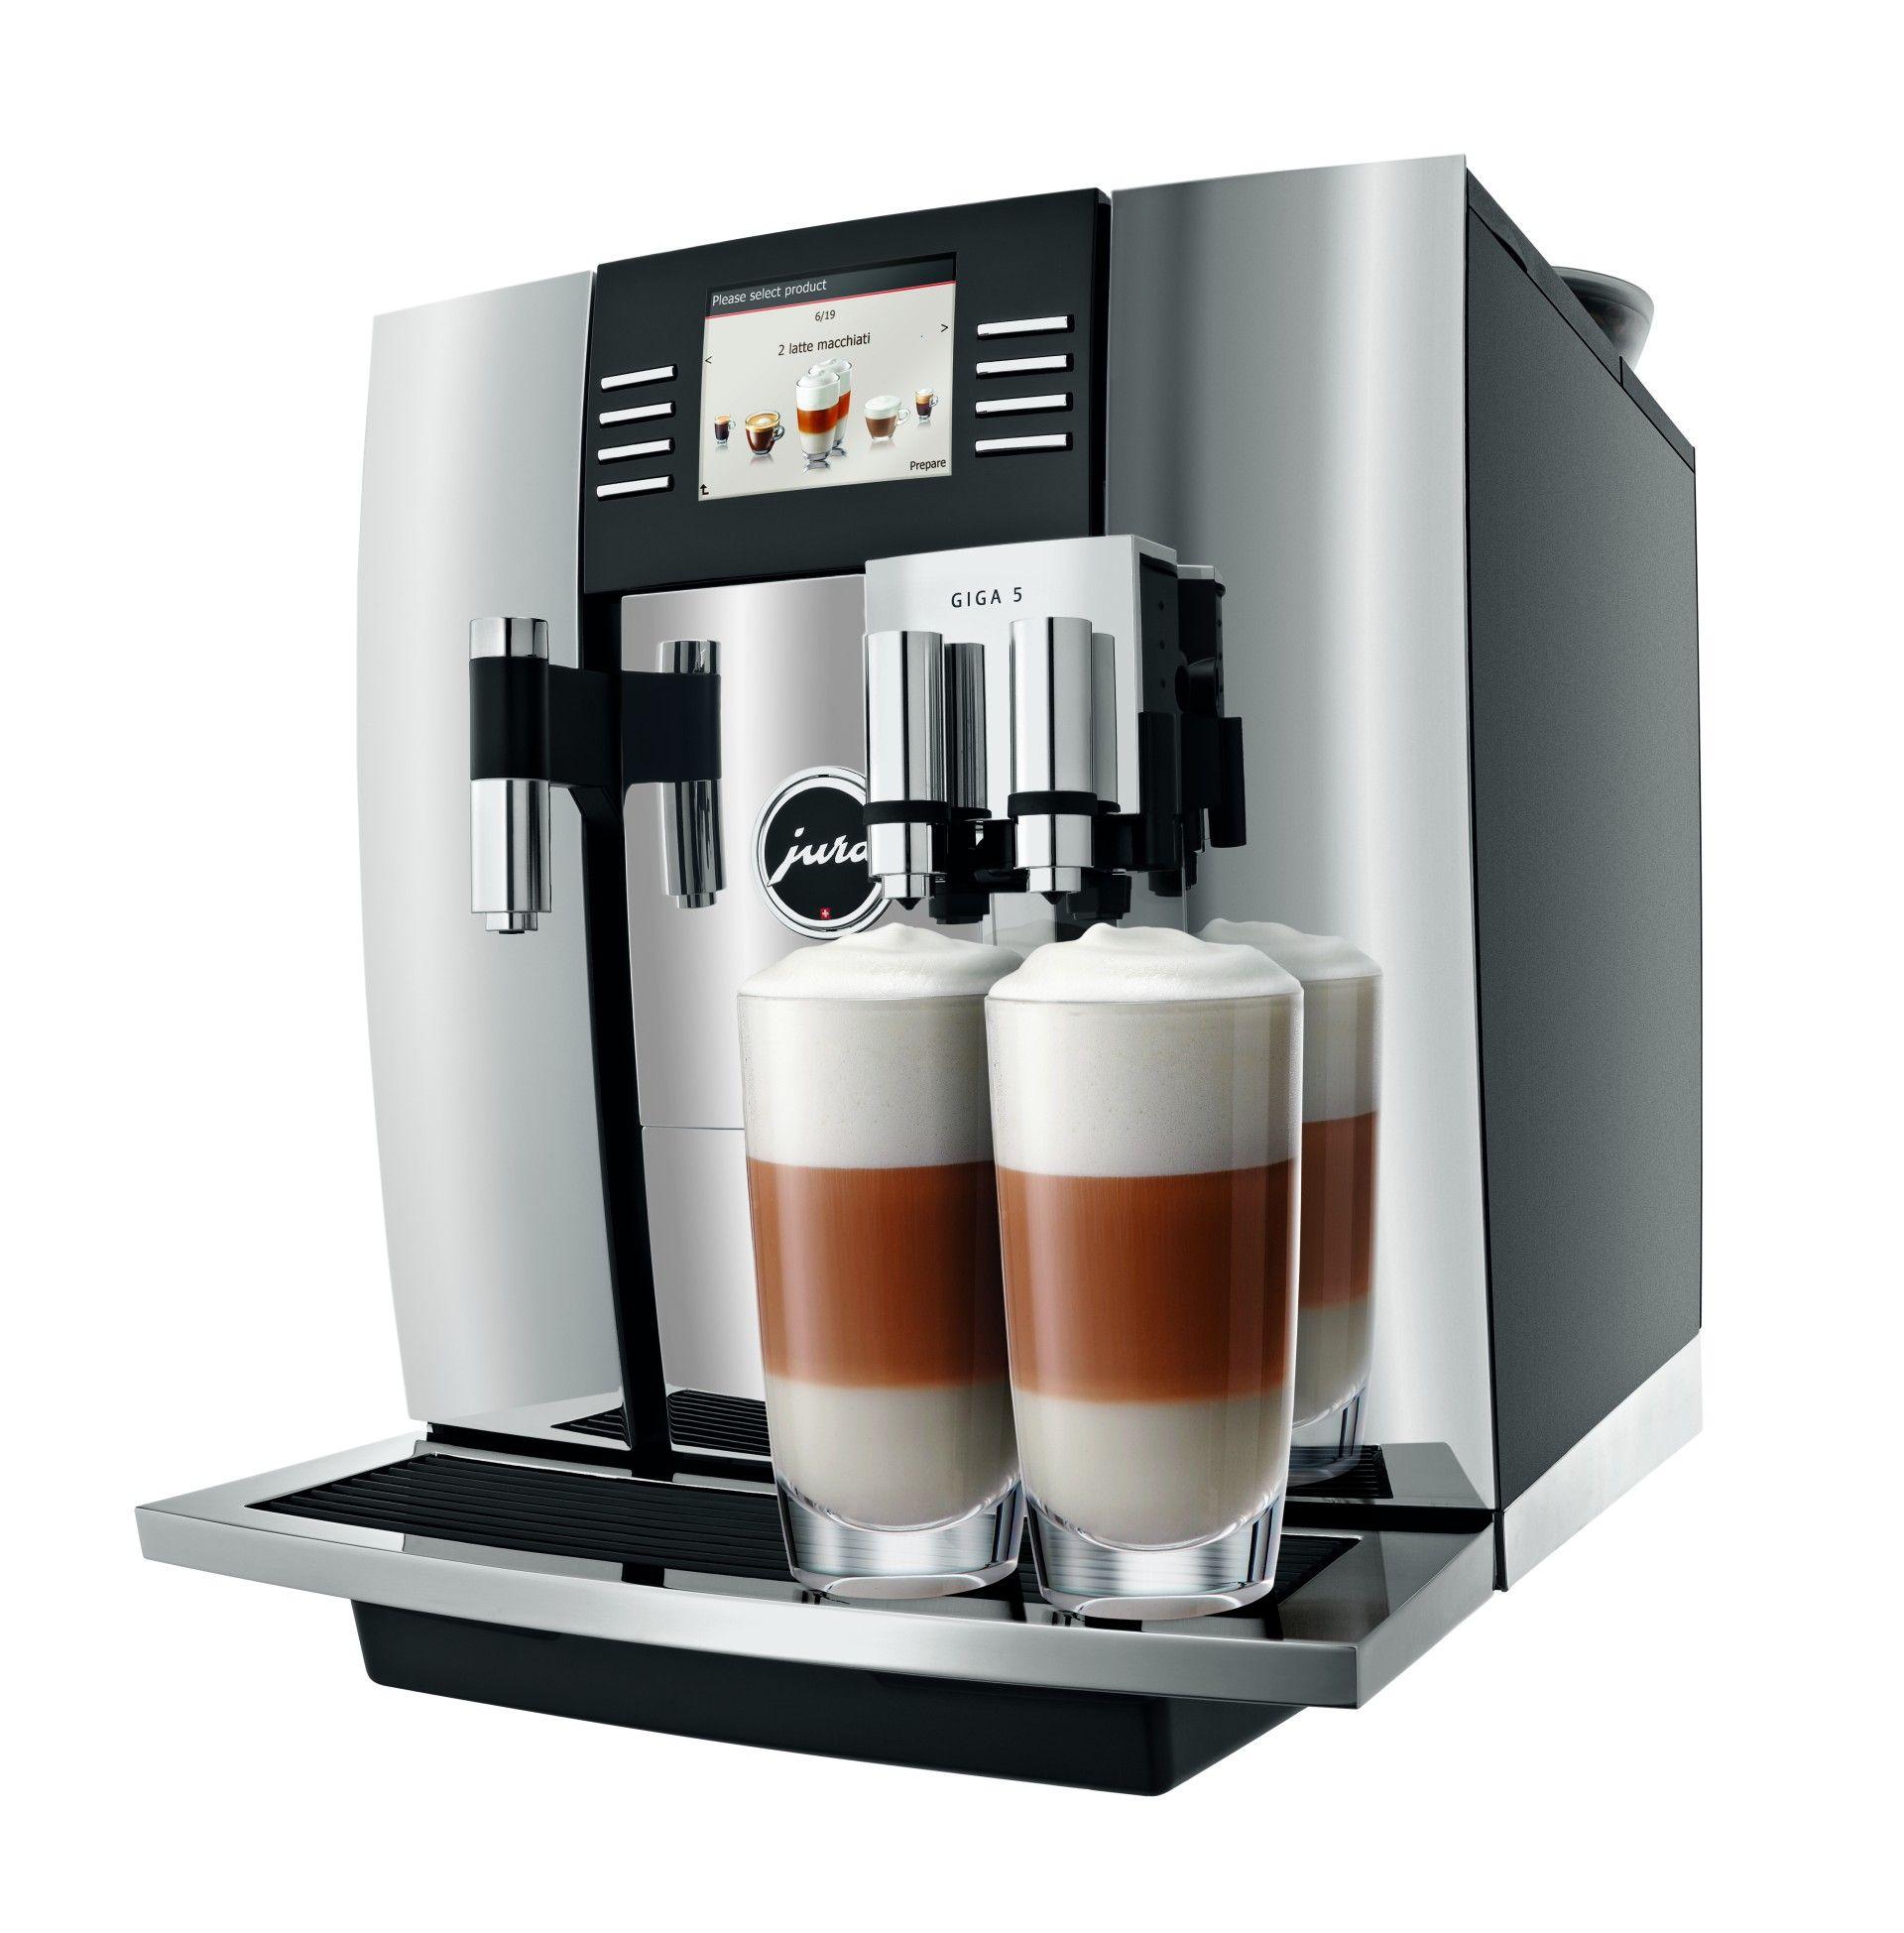 Jura GIGA 5 Кофемашины